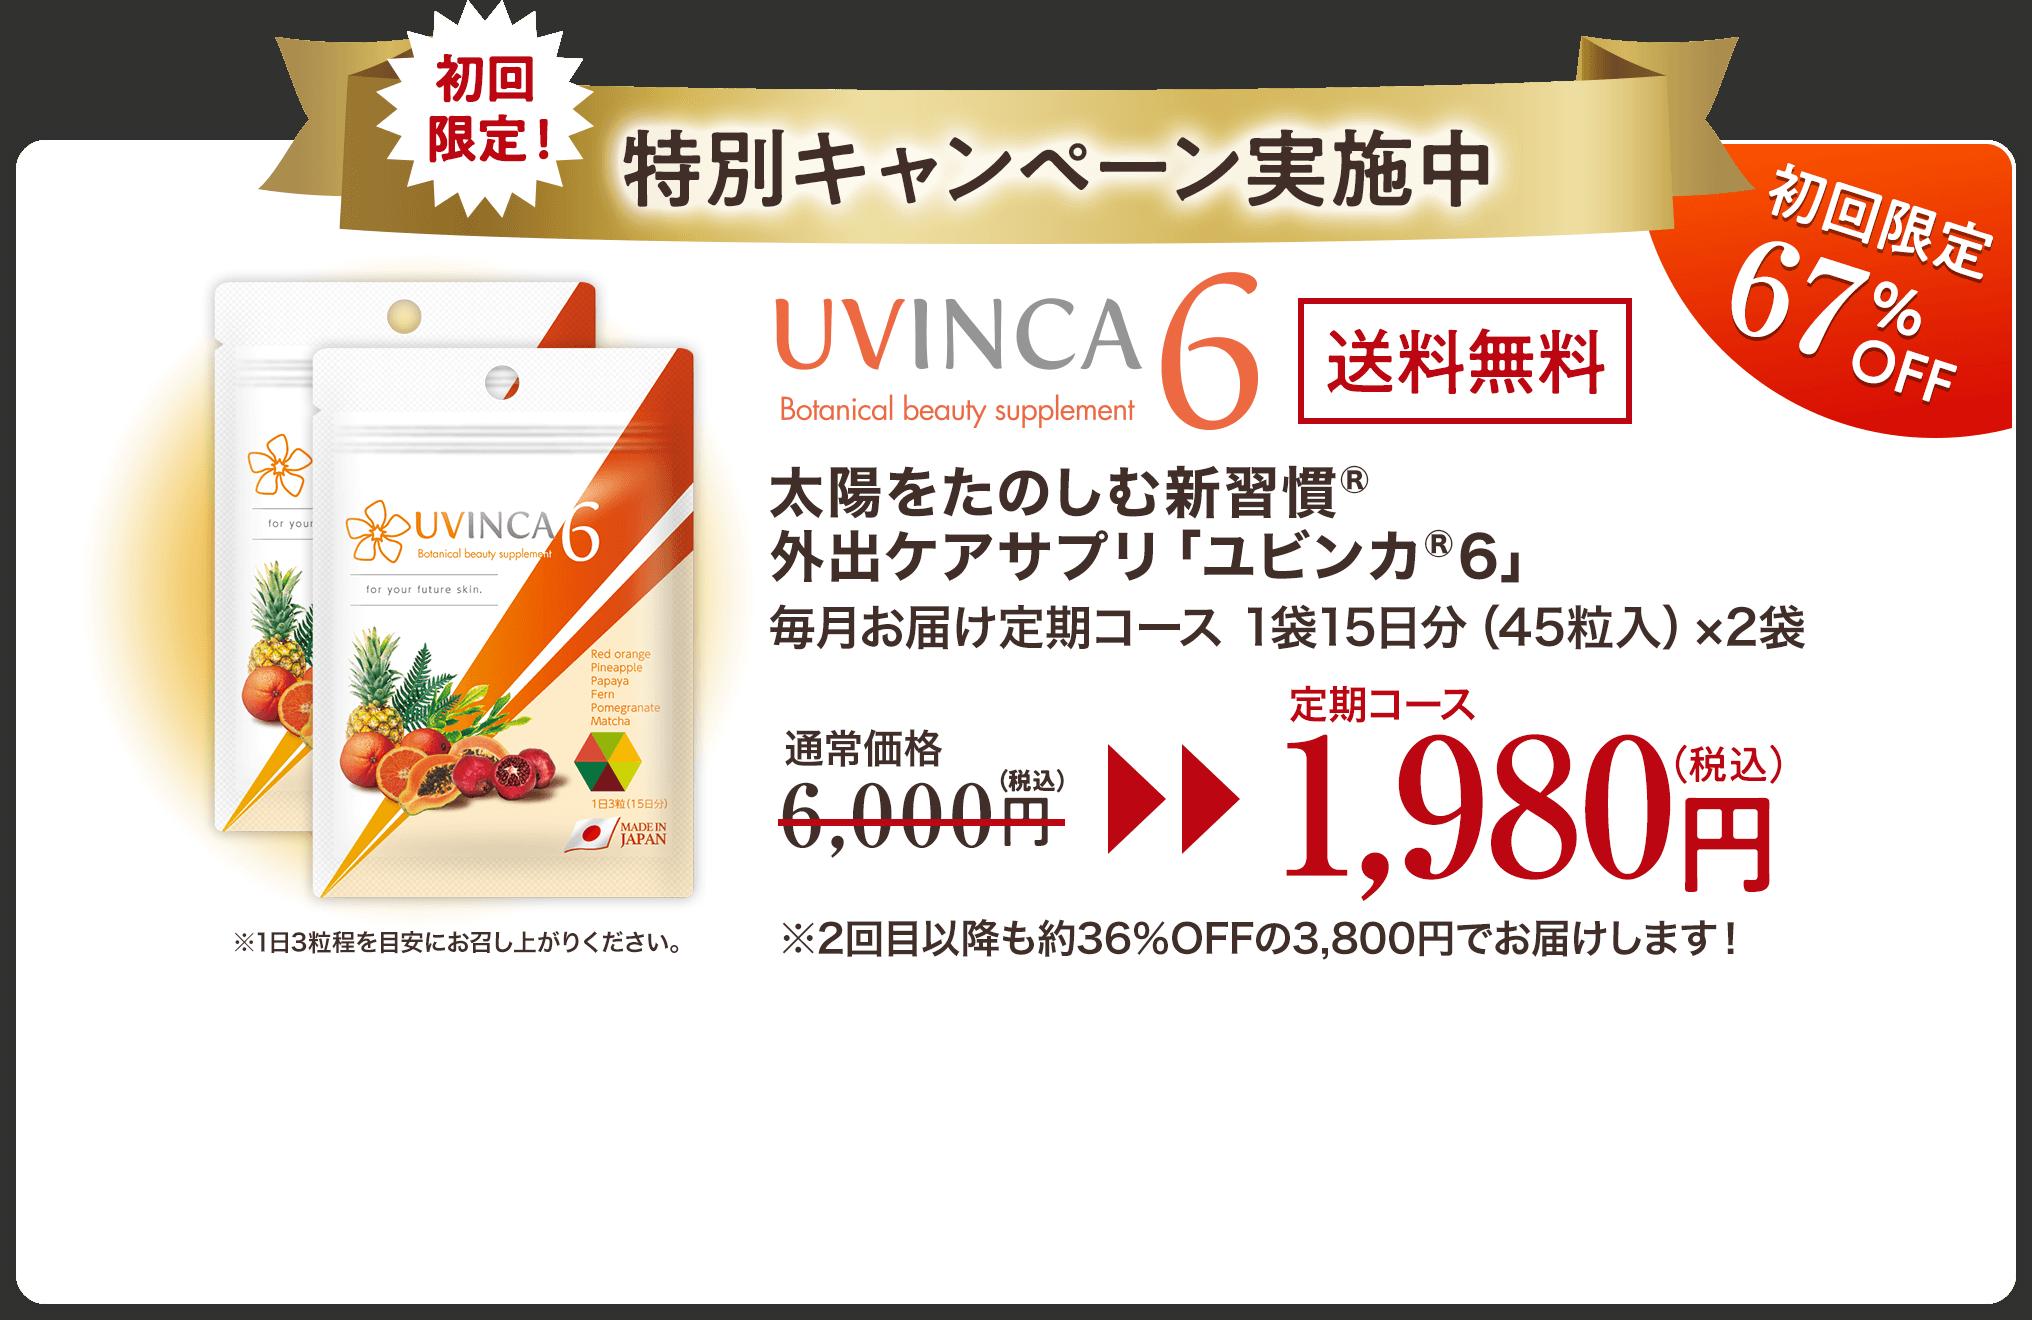 UVINCA6